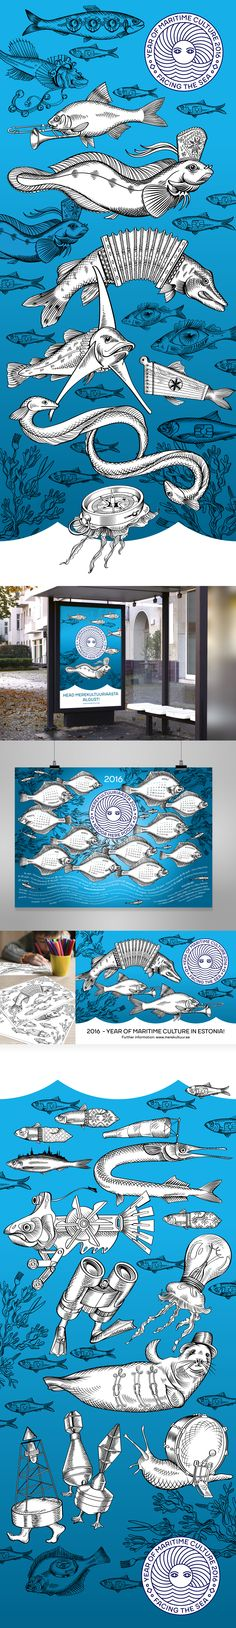 Merekultuuriaasta 2016 (Year of Maritime Culture) identity and illustrations. Design and illustrations Maret Põldre, Creative Director Ionel Lehari.www.identity.ee.